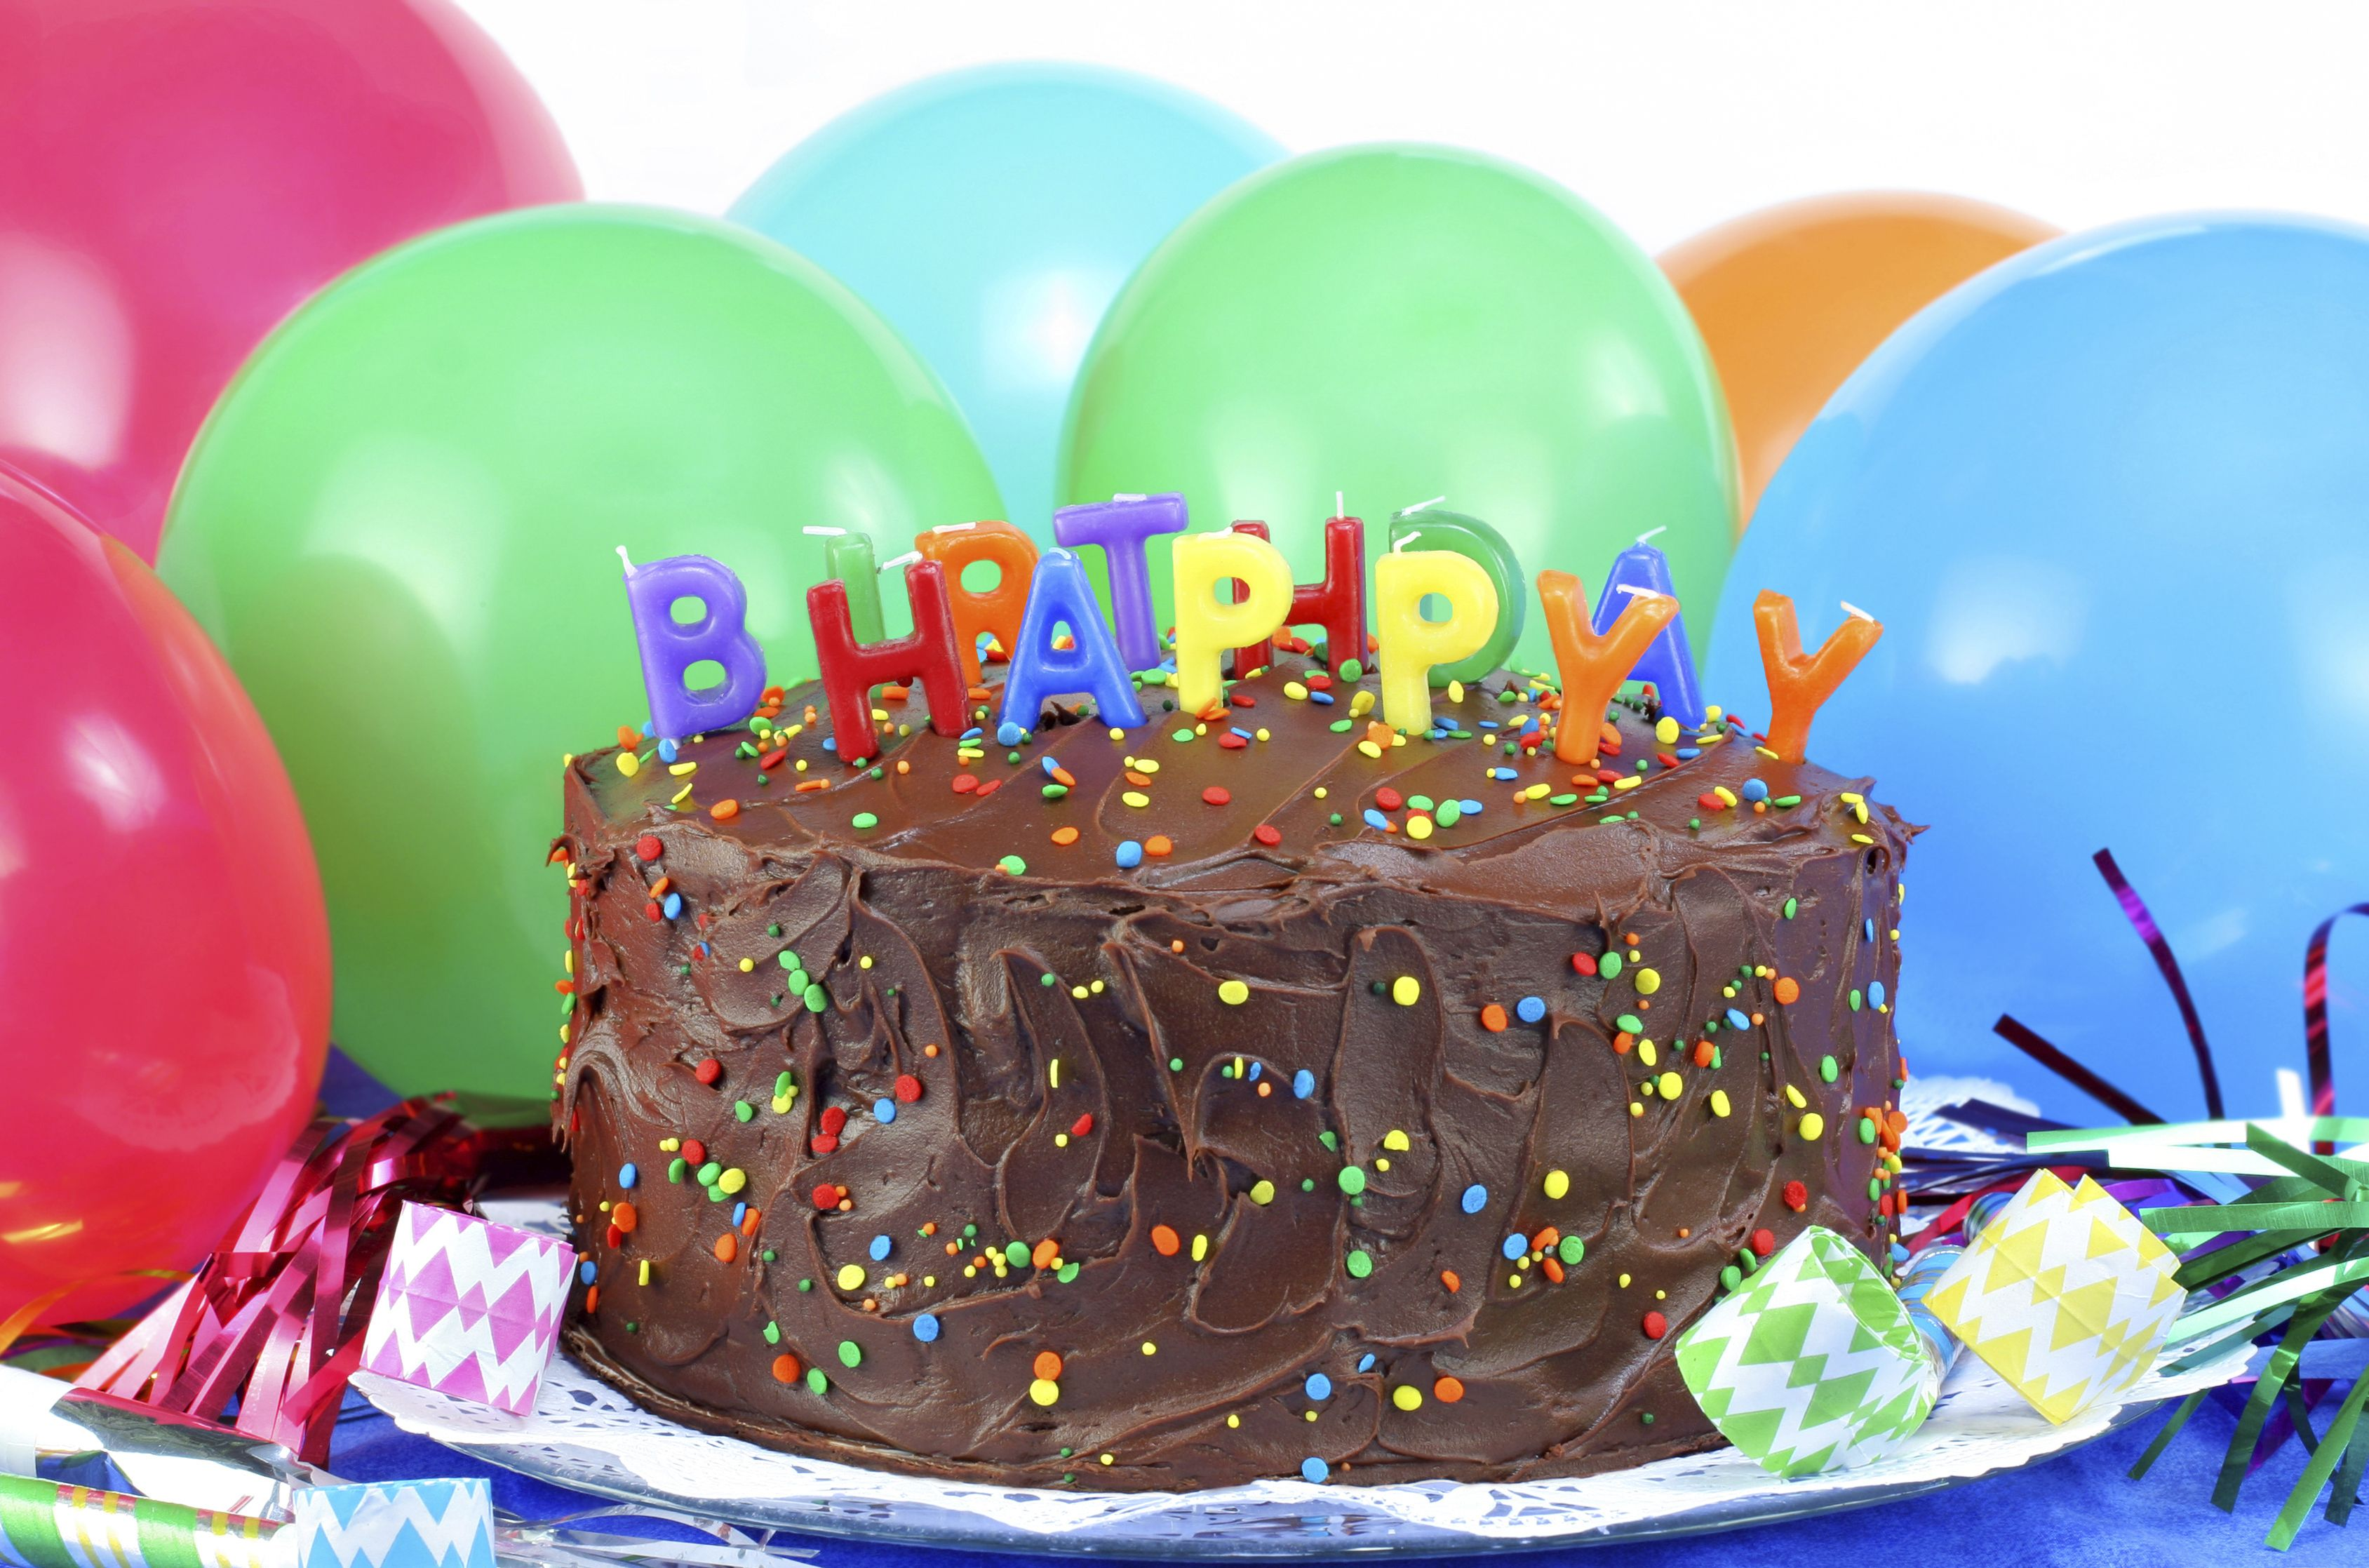 Feliz Cumpleaños Mi Querida MagAnnita Cacfd69153c3dfc3856dea9dd84cd4af